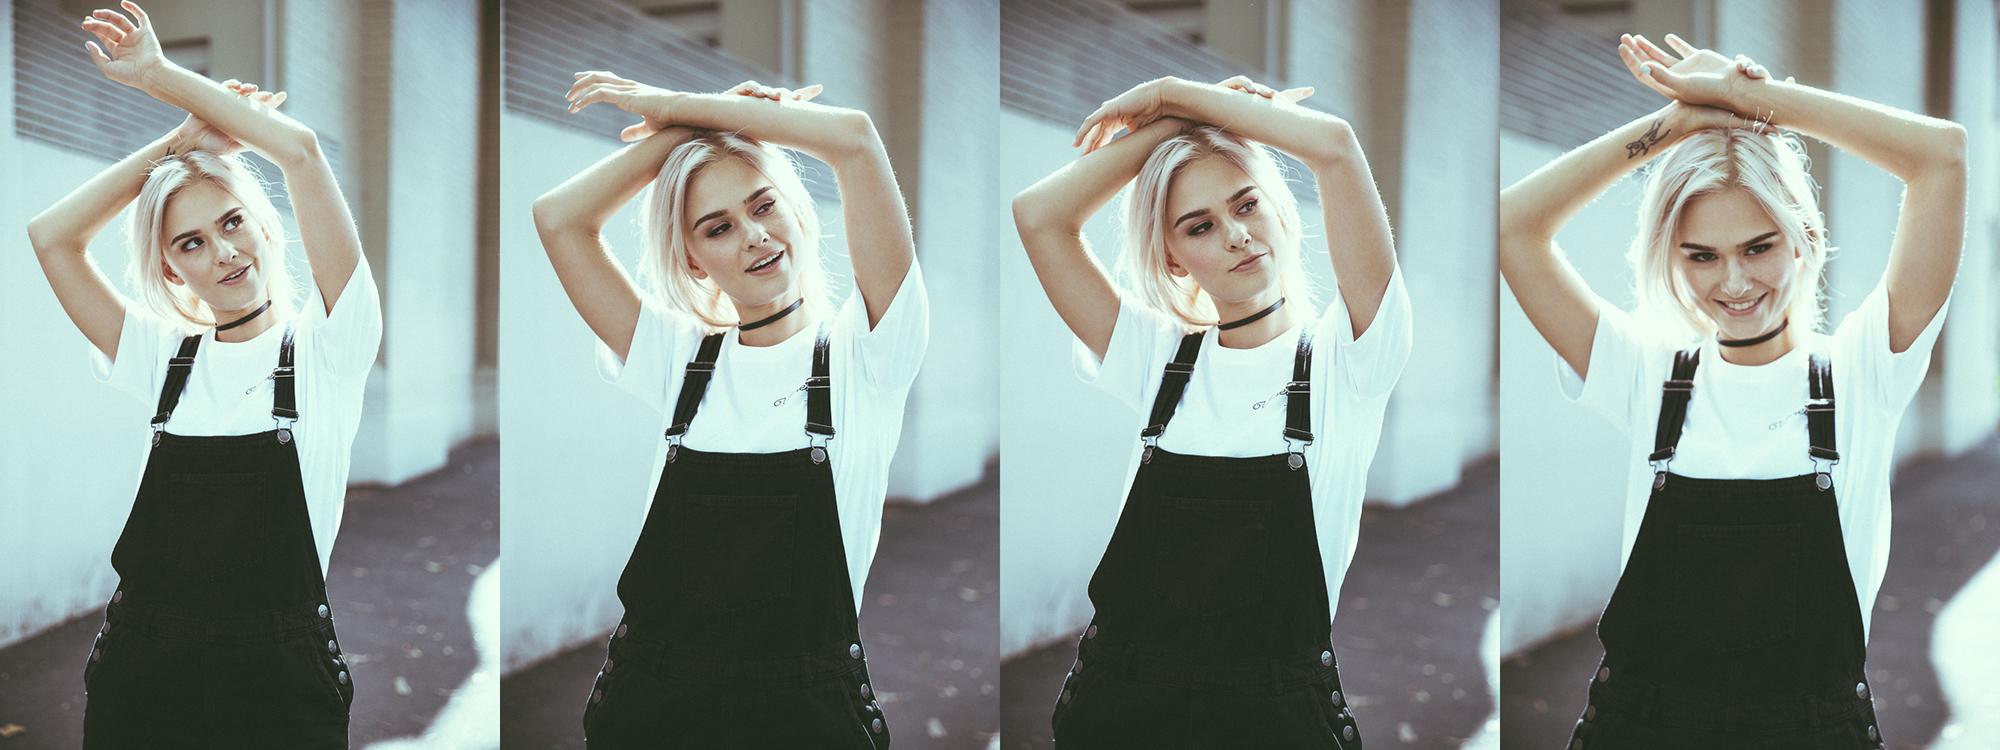 Nicole-Millar-ii_Copyright-Dani-Hansen_2000px